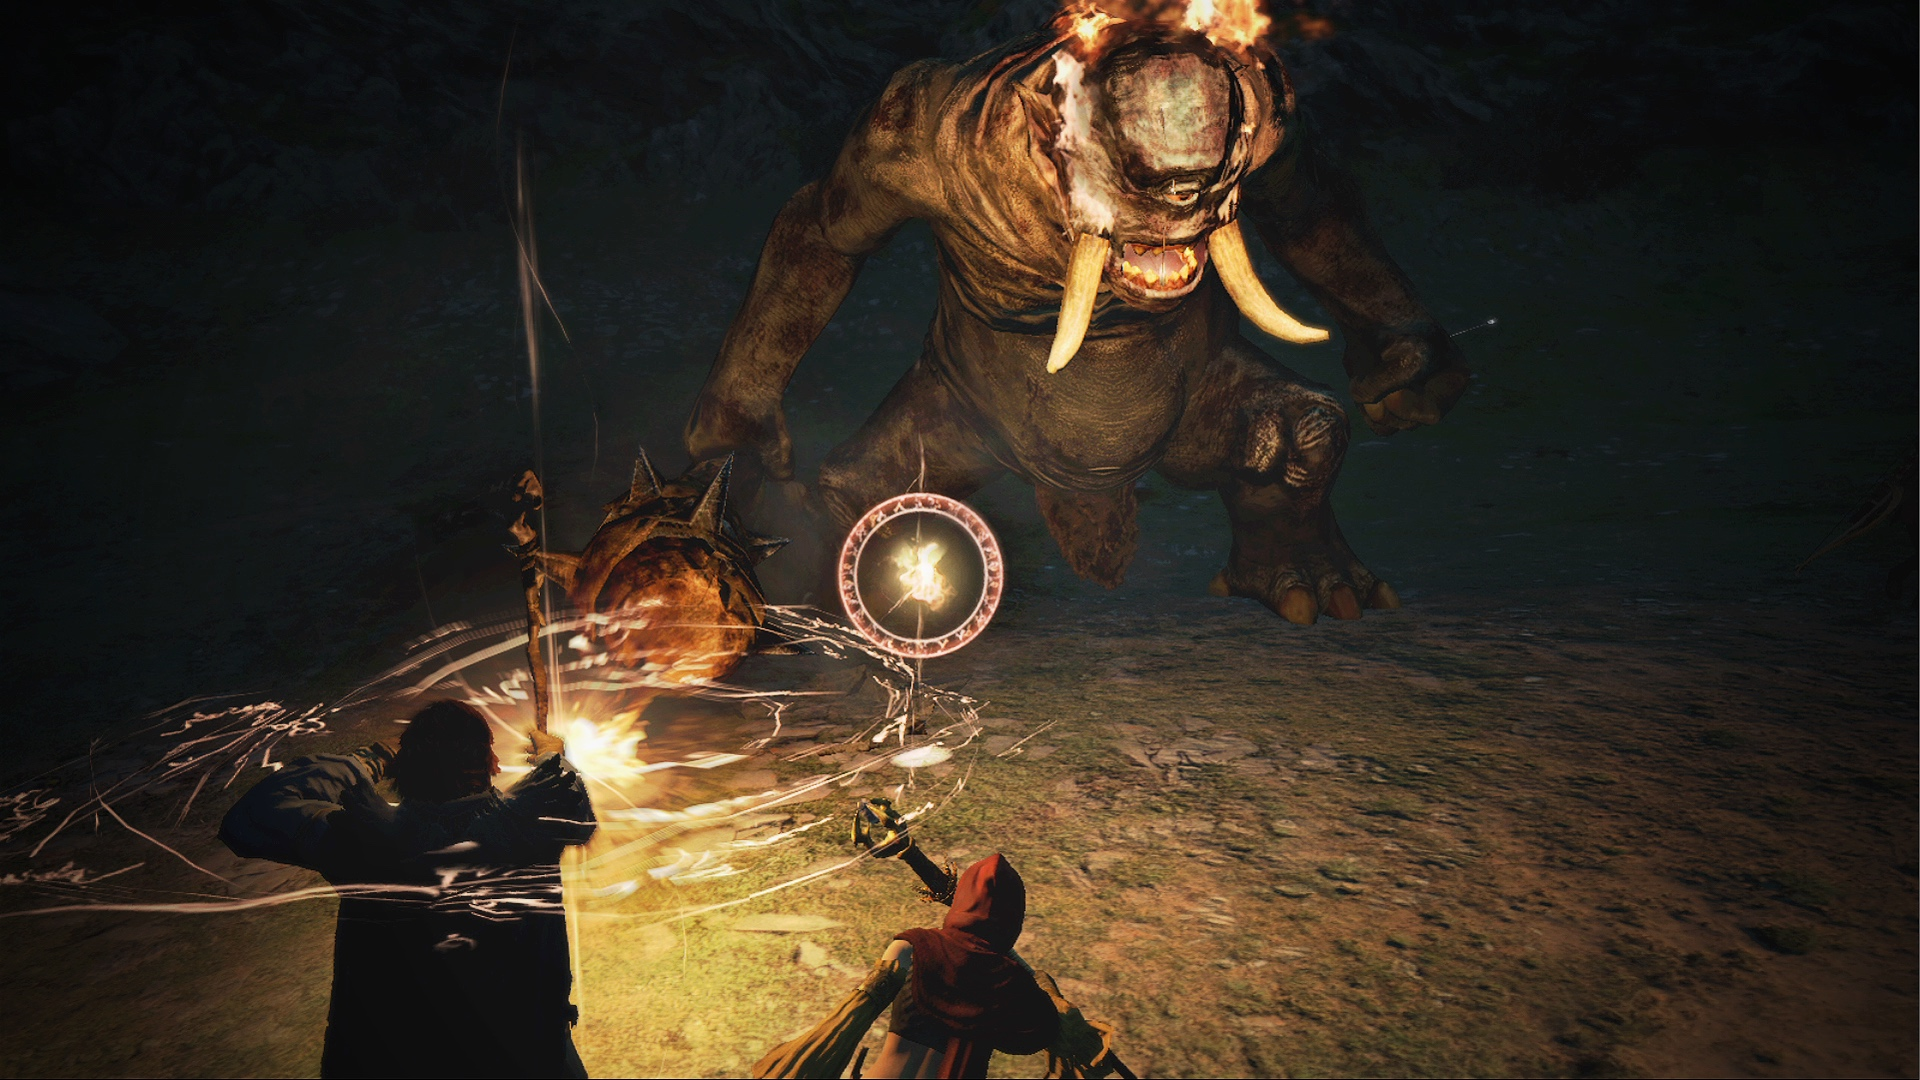 Dark Arisen Capcom Dragons Dogma Switch Review 1899461 Hd